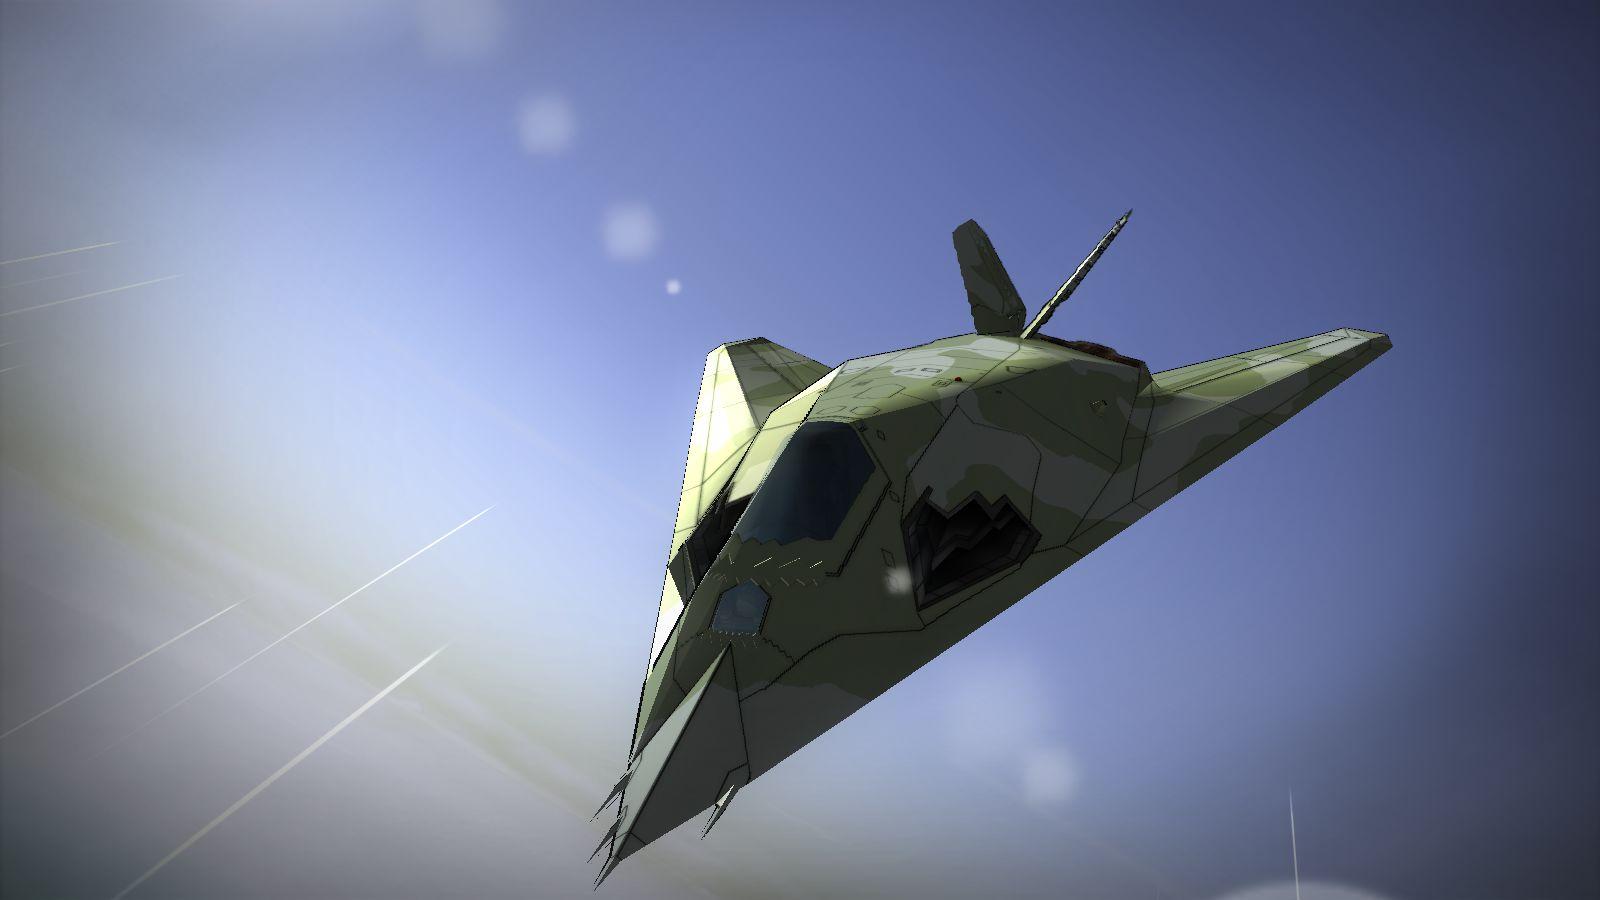 Vector Thrust Game Review - Common Sense Media